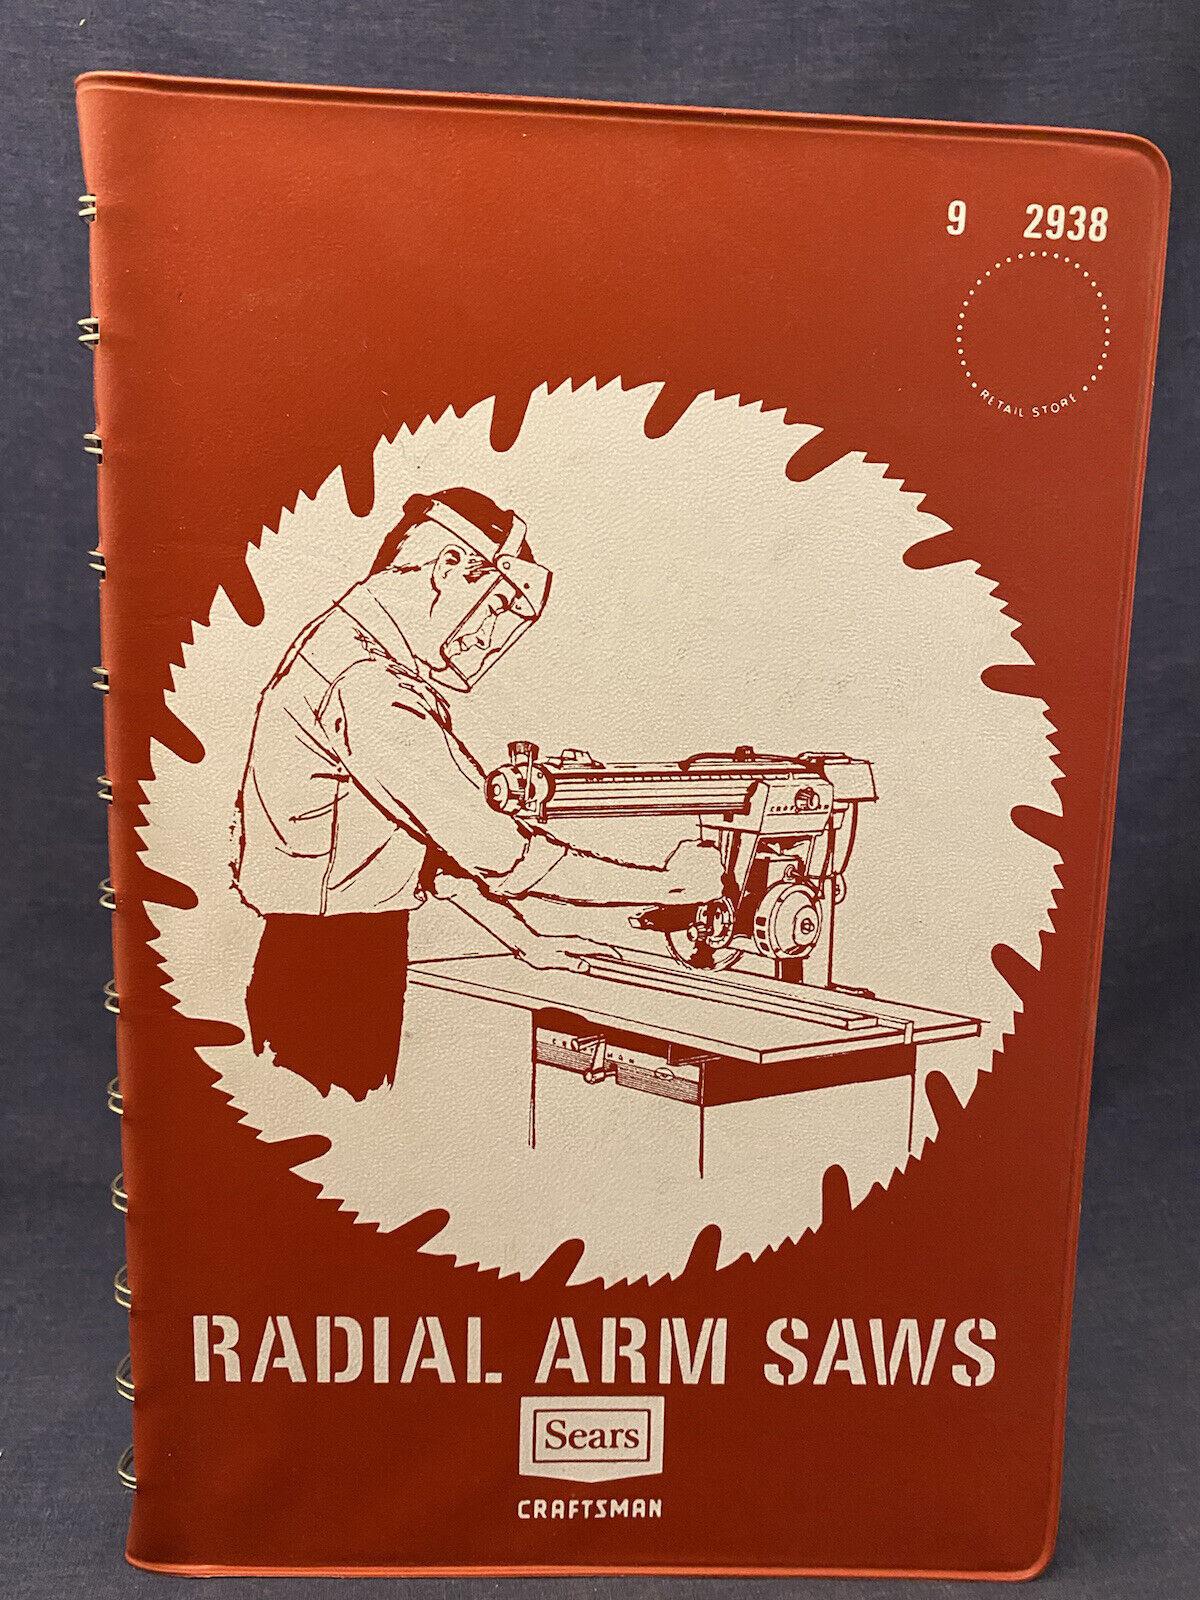 1965 Sears Craftsman Radial Arm Saws Manual Set-up Book Operations Vintage 2938